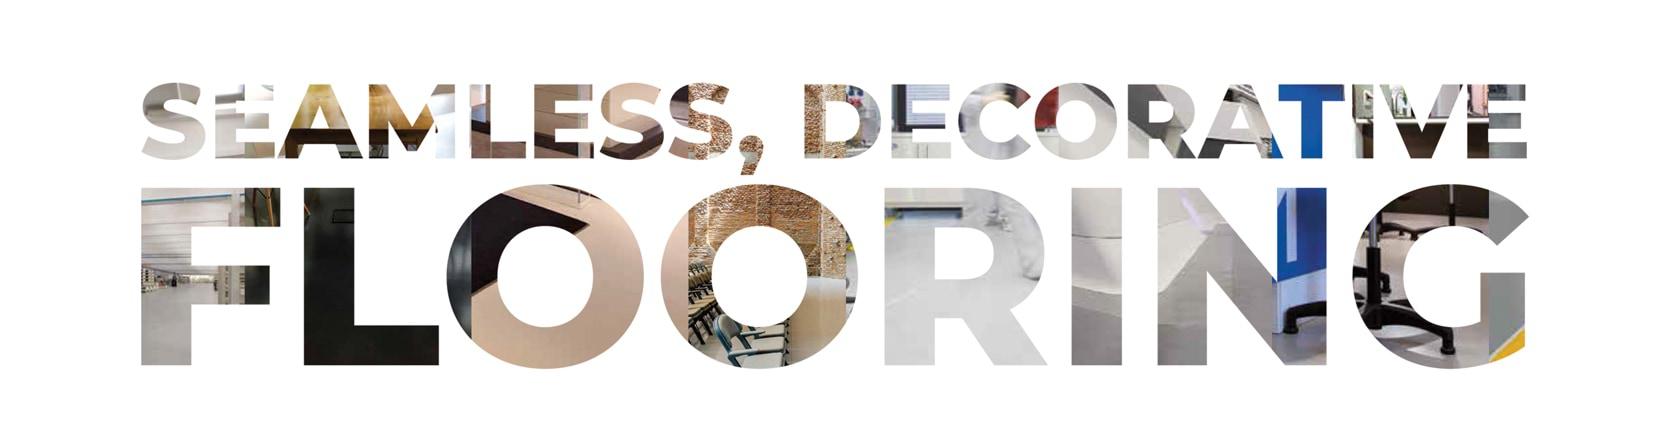 Seamless-Decorative-Flooring-slider-Landingpage_Desktop-2